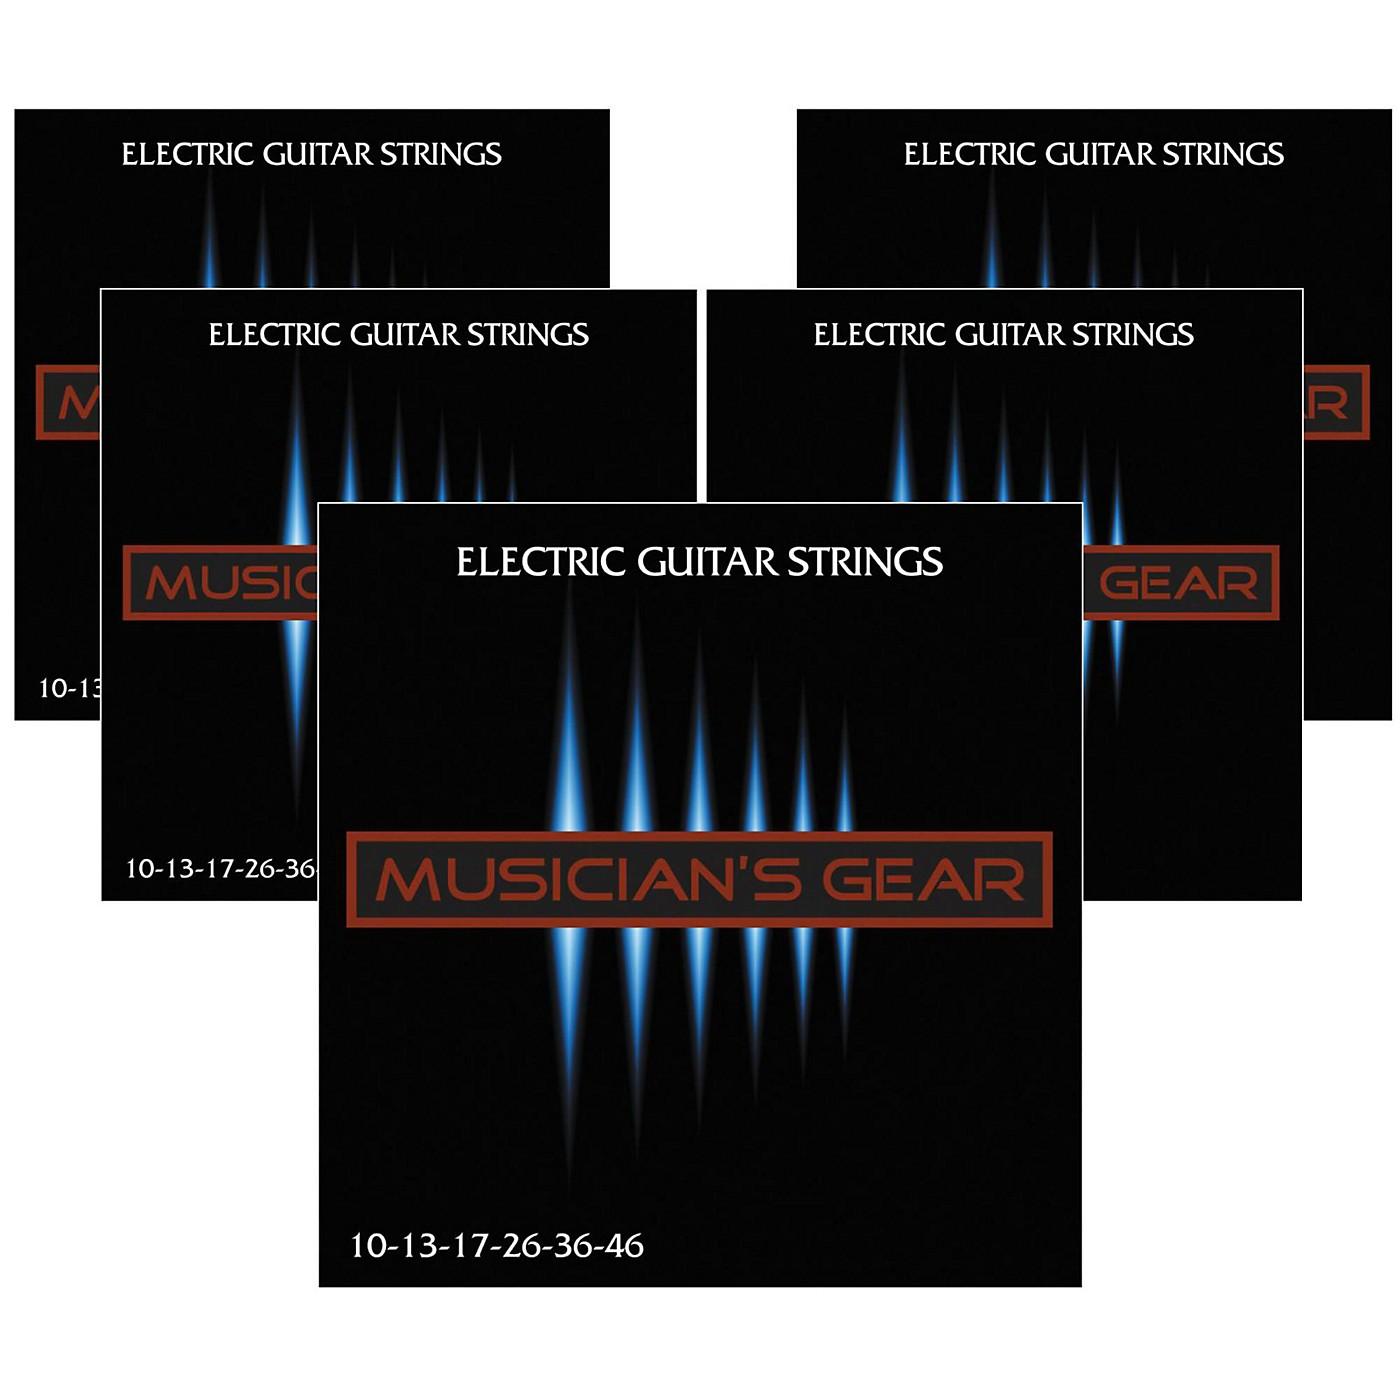 Musician's Gear Electric Nickel Plated Steel Guitar Strings 10-46 - 5-Pack thumbnail